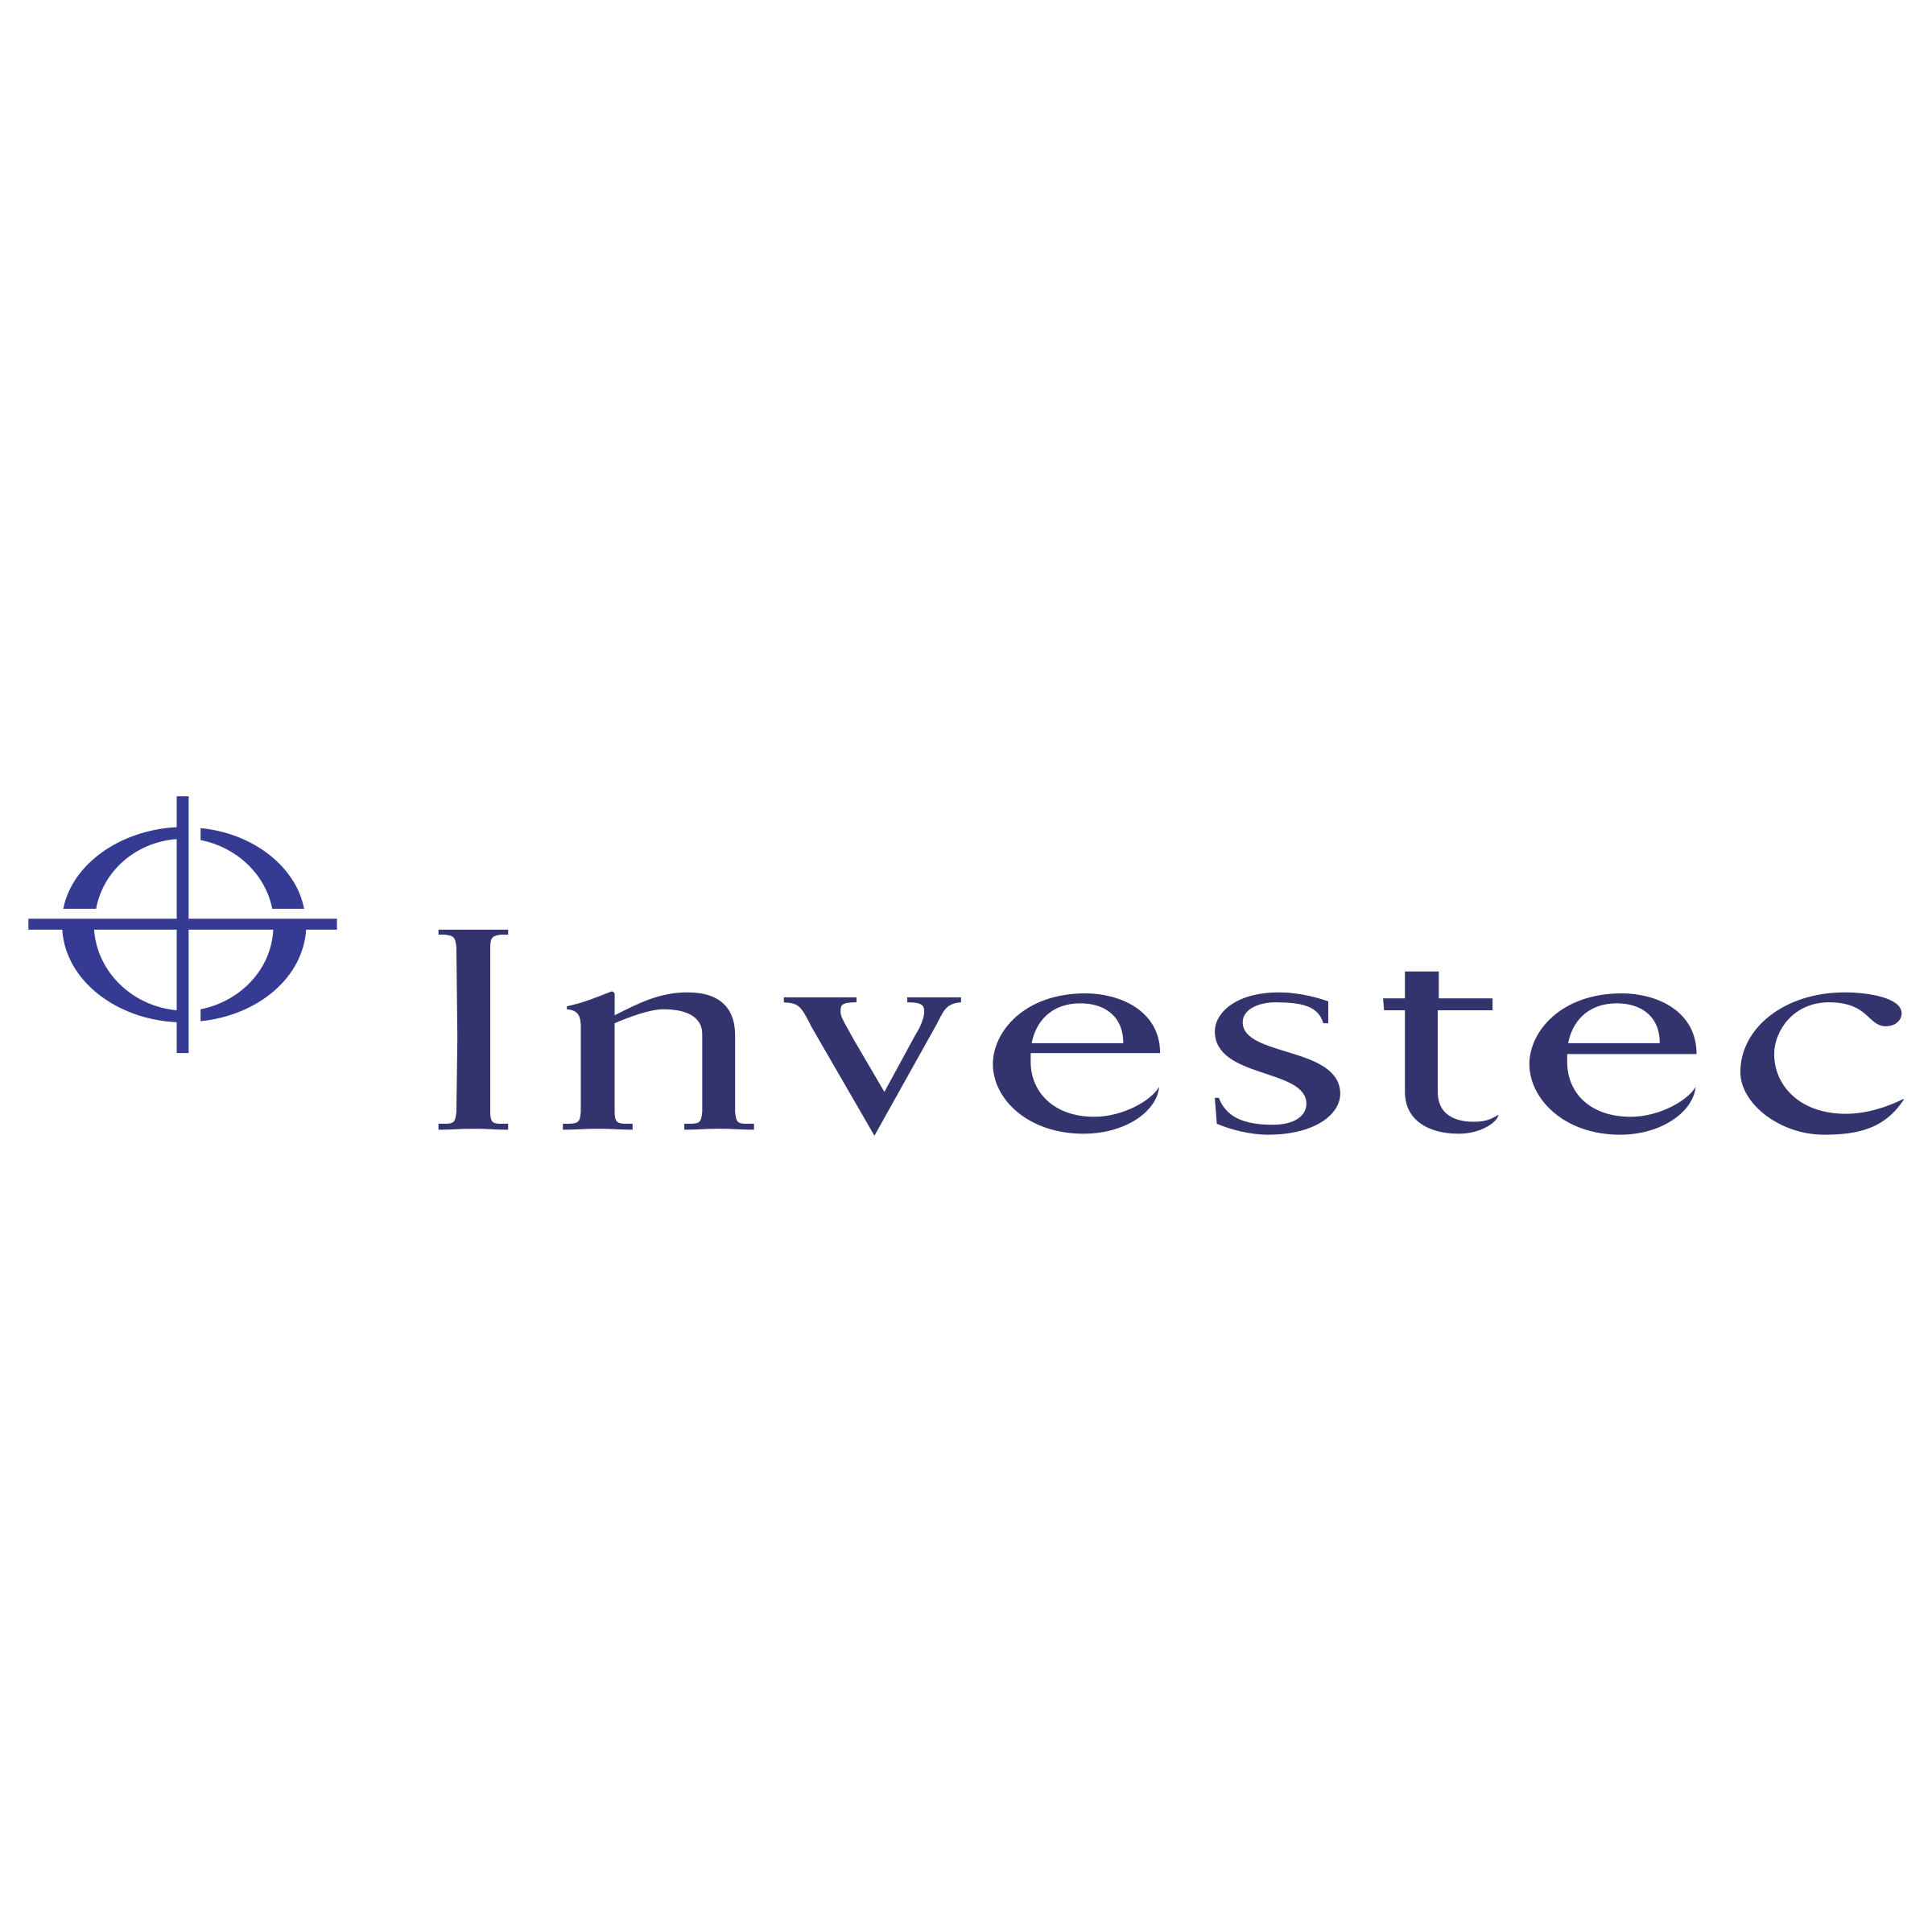 investec-logo-png-transparent.png